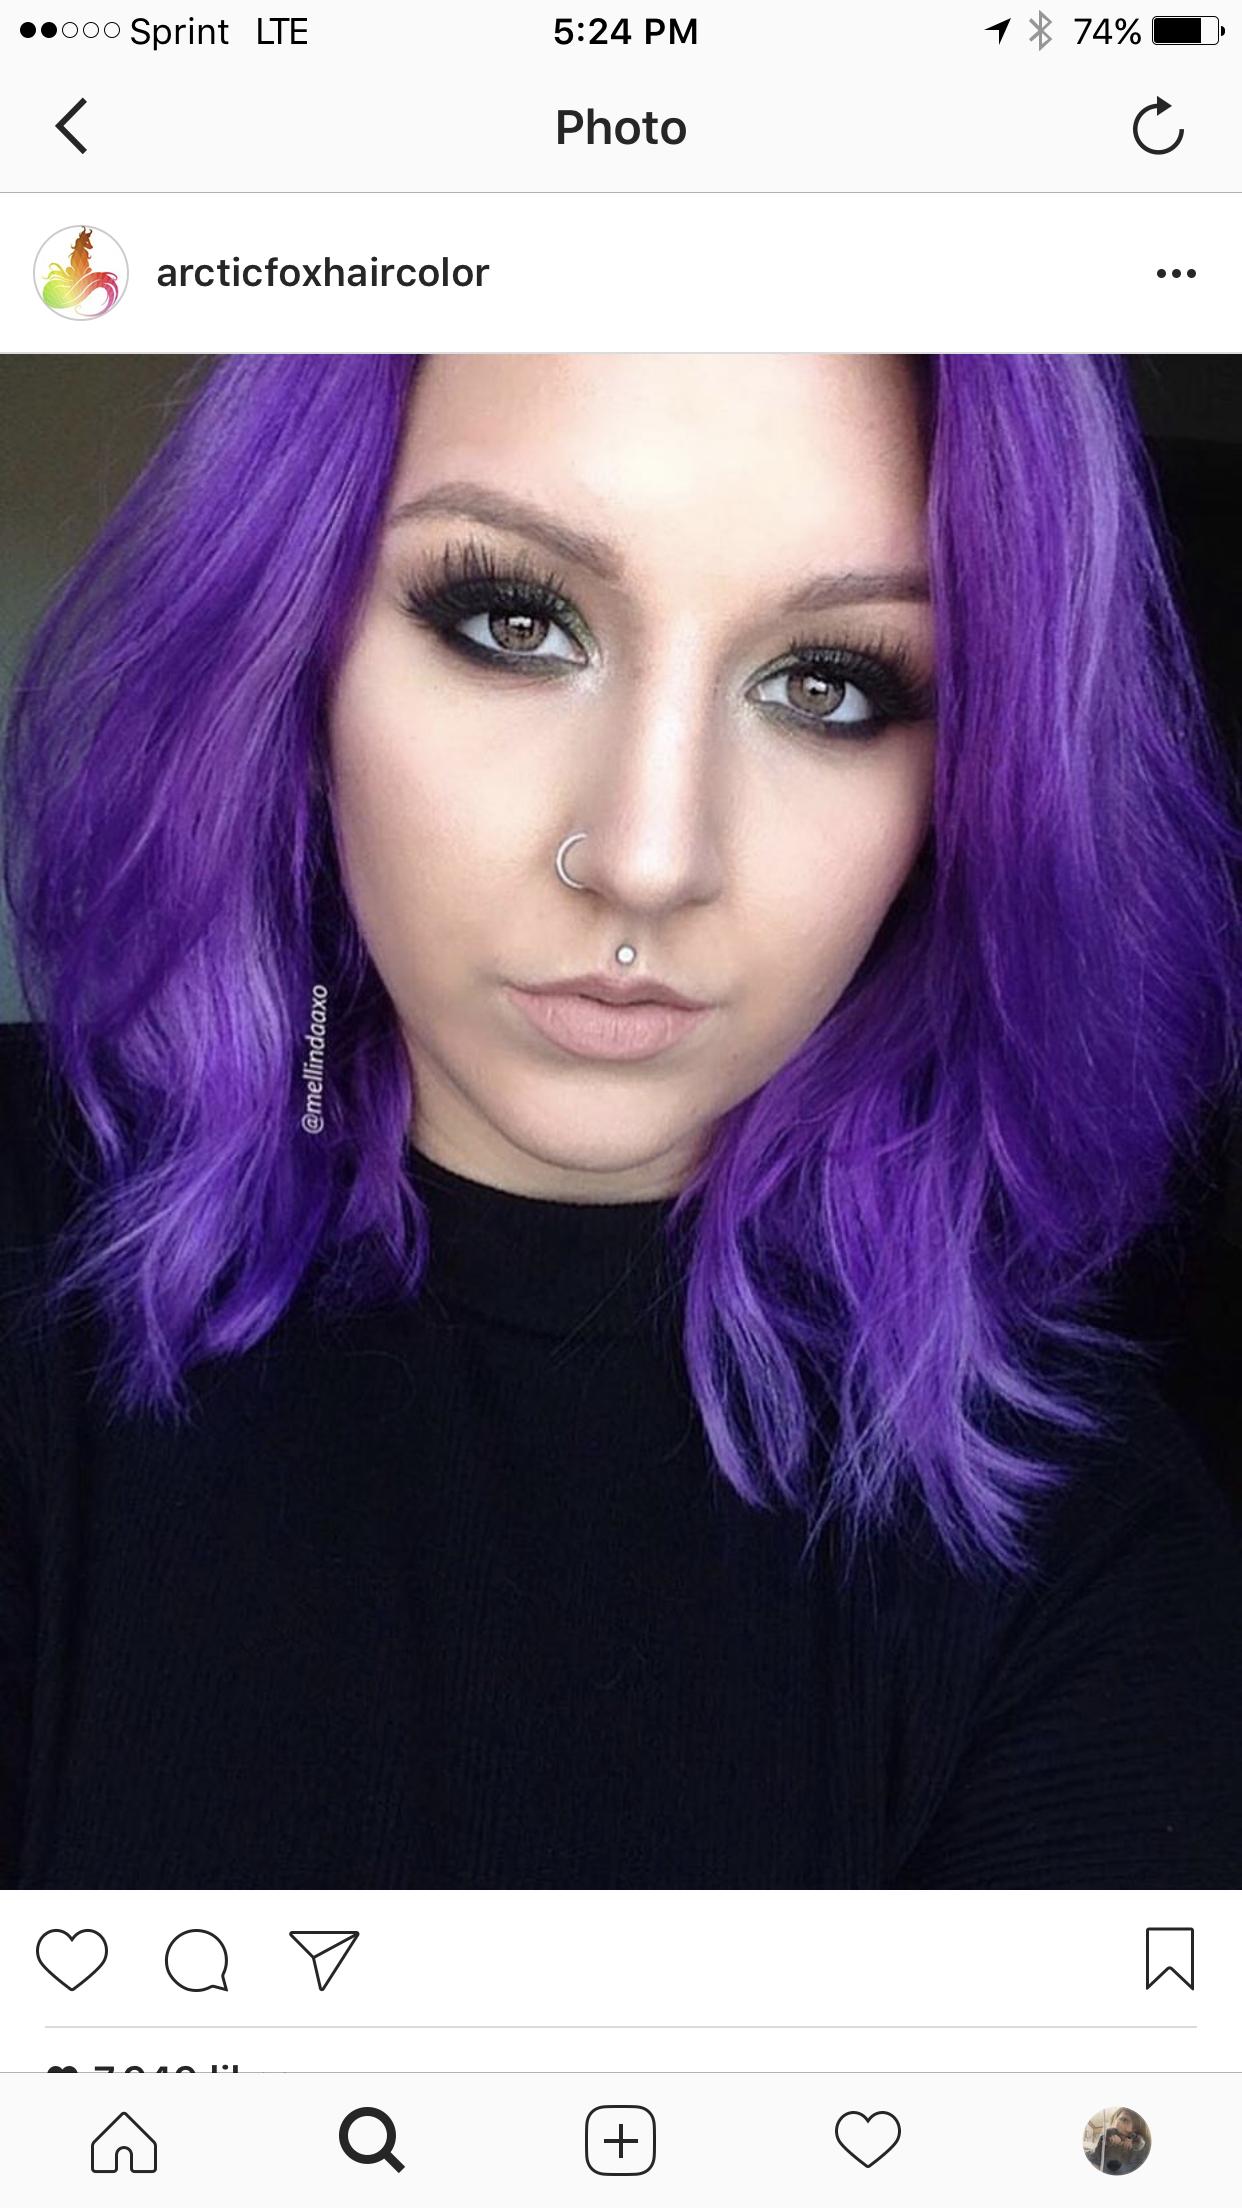 Purple Rain Arctic Fox Hair Coloring Hair Color Images Purple Hair Arctic Fox Hair Color